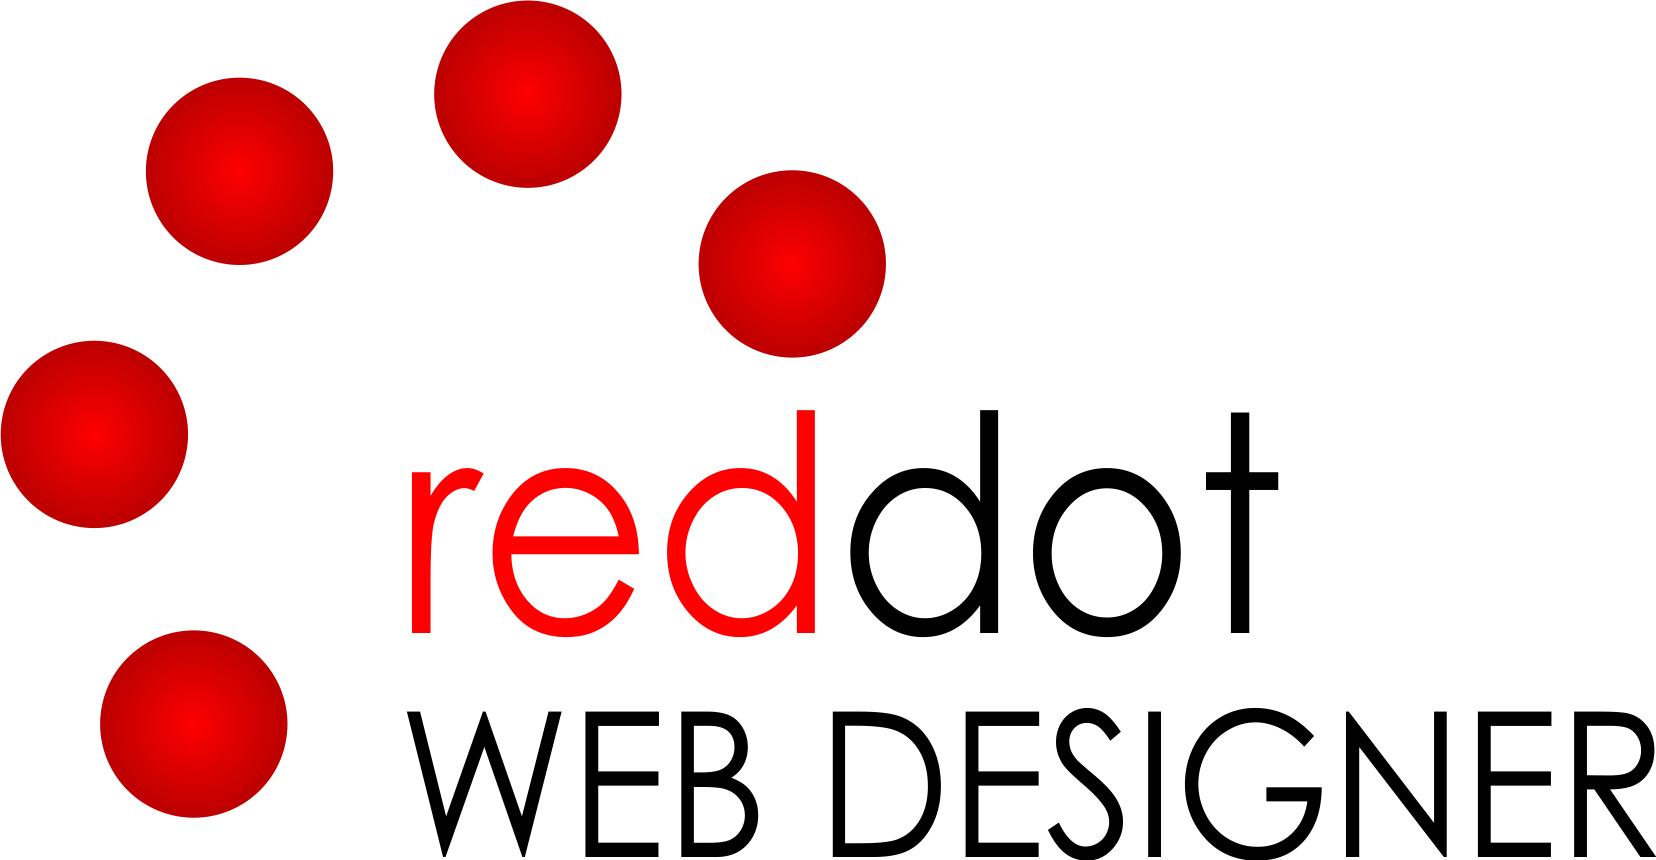 Reddot Web Designer